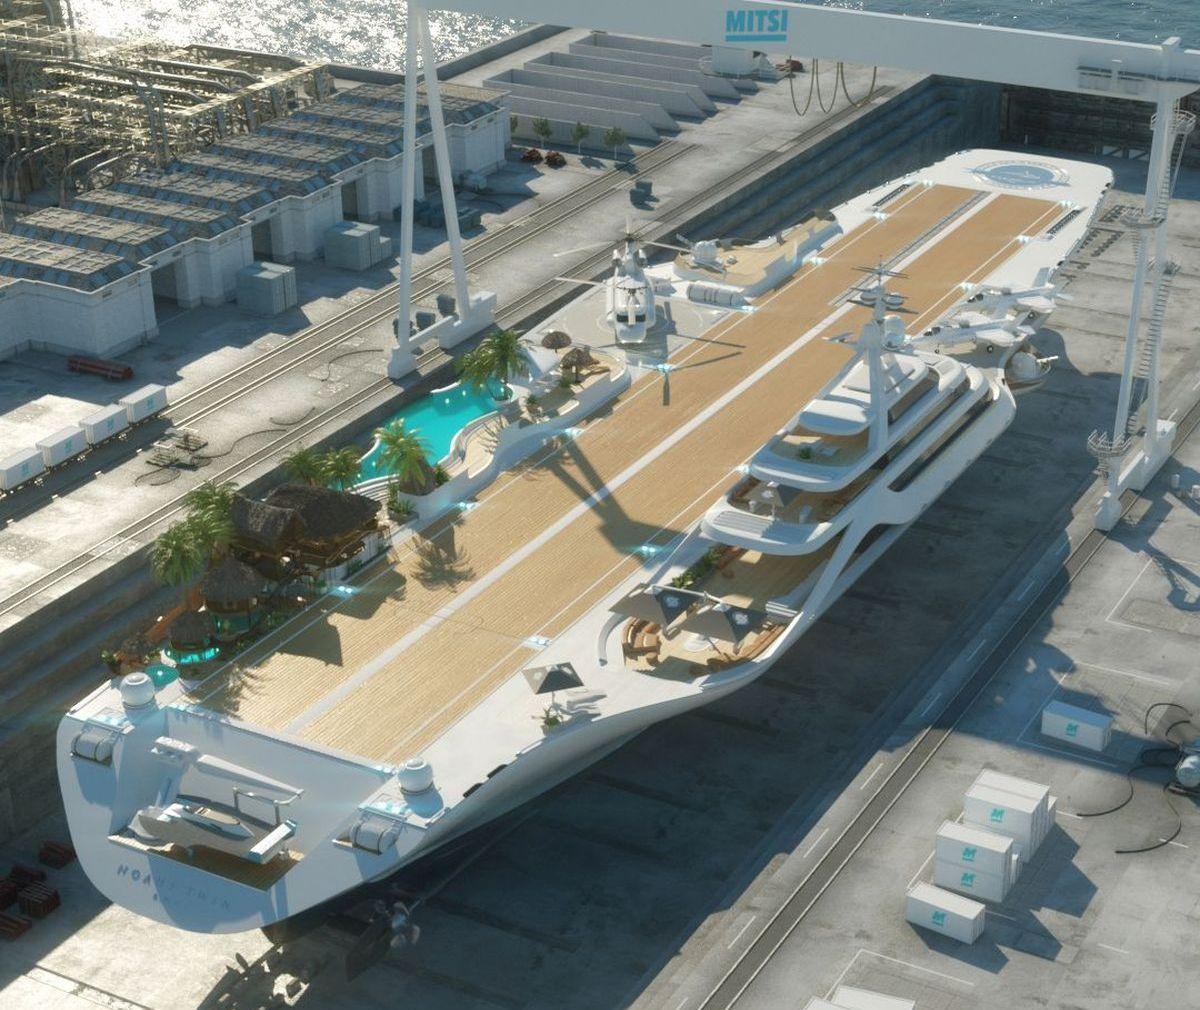 Flugzeugträger als Öko-Investment